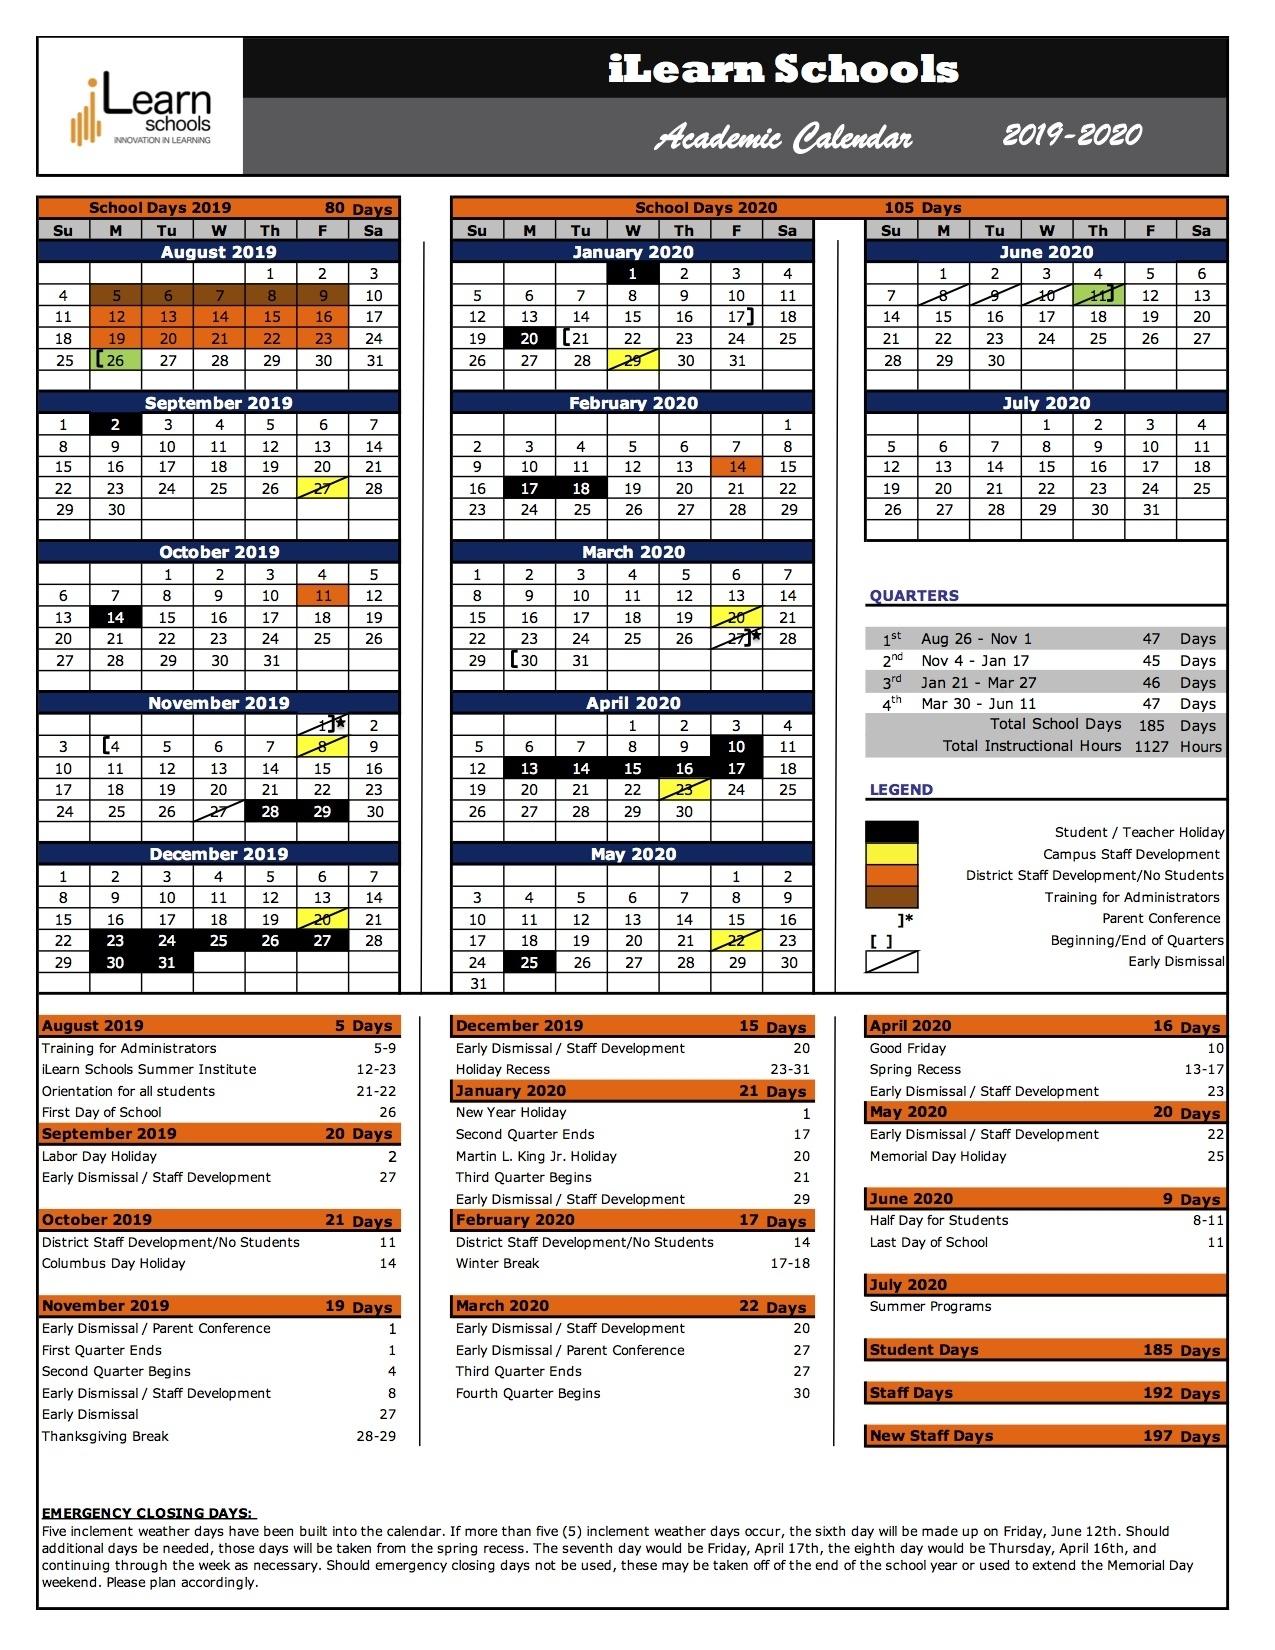 U Of M Calendar 2019-2020 School Year | Calendar Template inside U Of M 2019 2020 Calendar